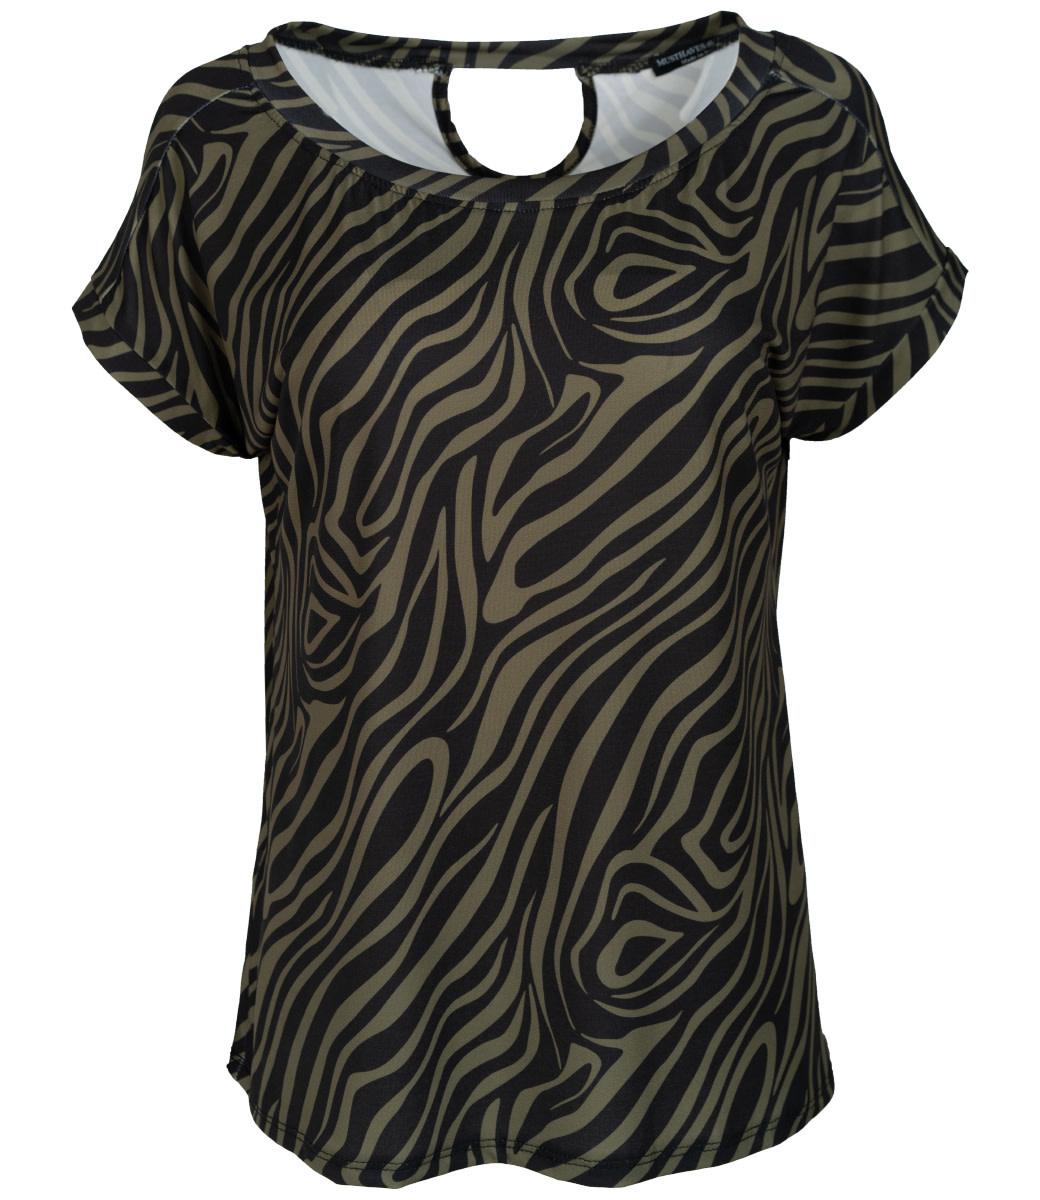 Wannahavesfashion Shirt zwart/groen zebra Macy